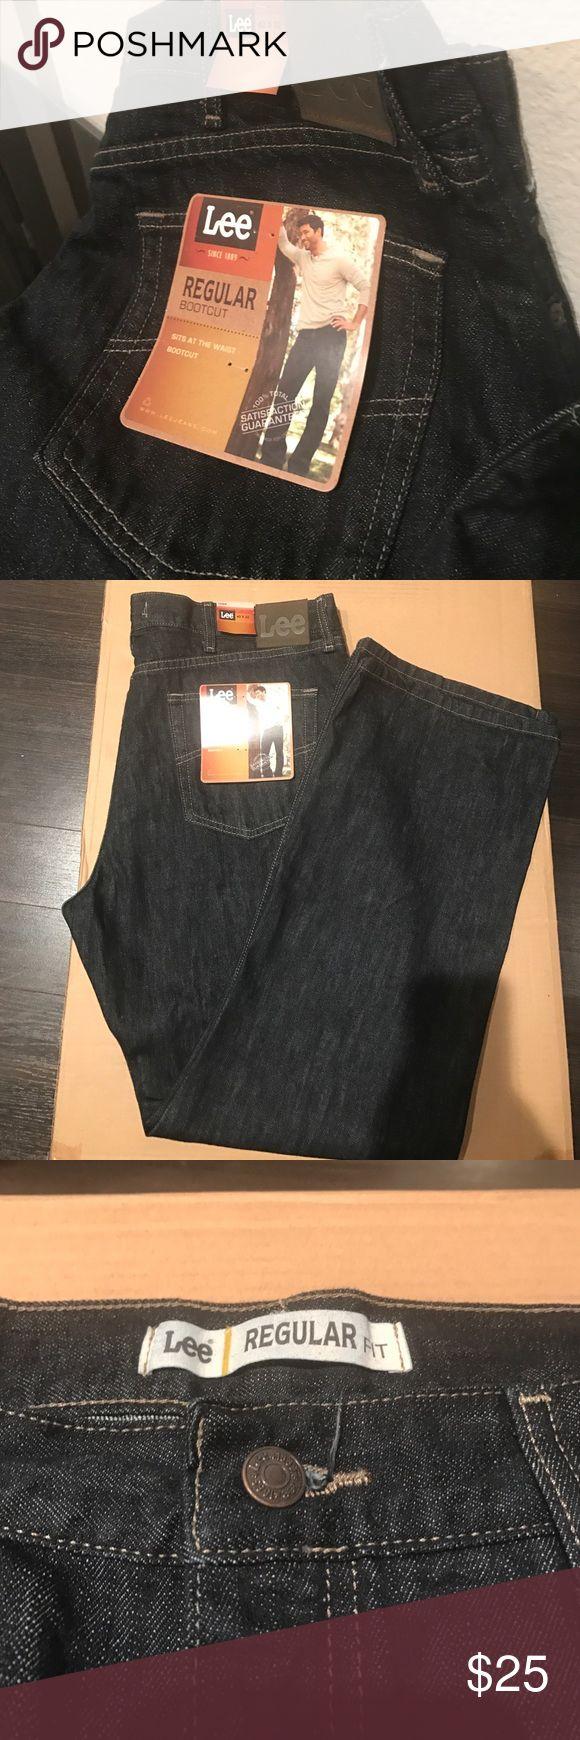 🆕🆕 Brand new Lee jeans, Regular Bootcut. Lee Jeans Regular Bootcut. Lee Jeans Bootcut